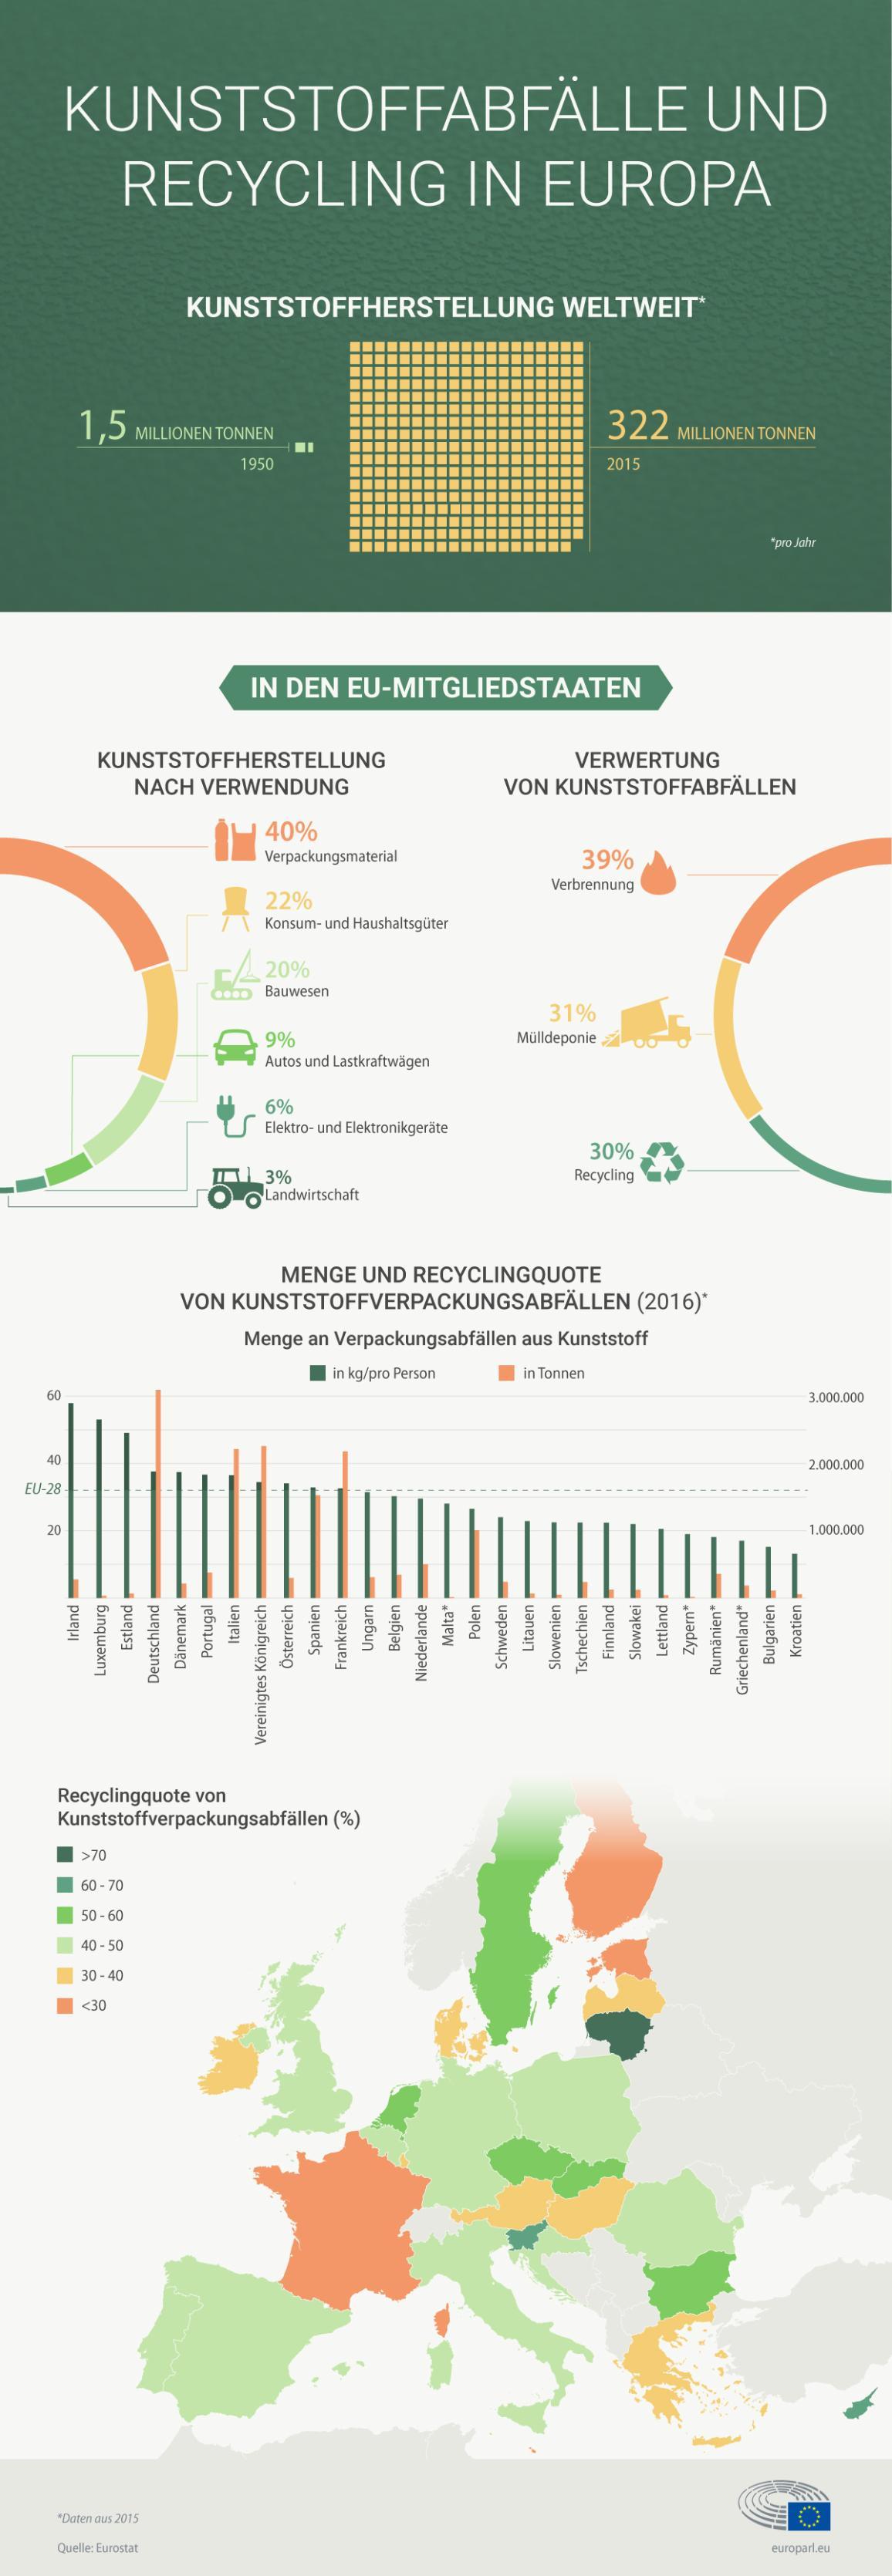 Zahlen und Fakten - Plastikrecyclingquoten pro Land